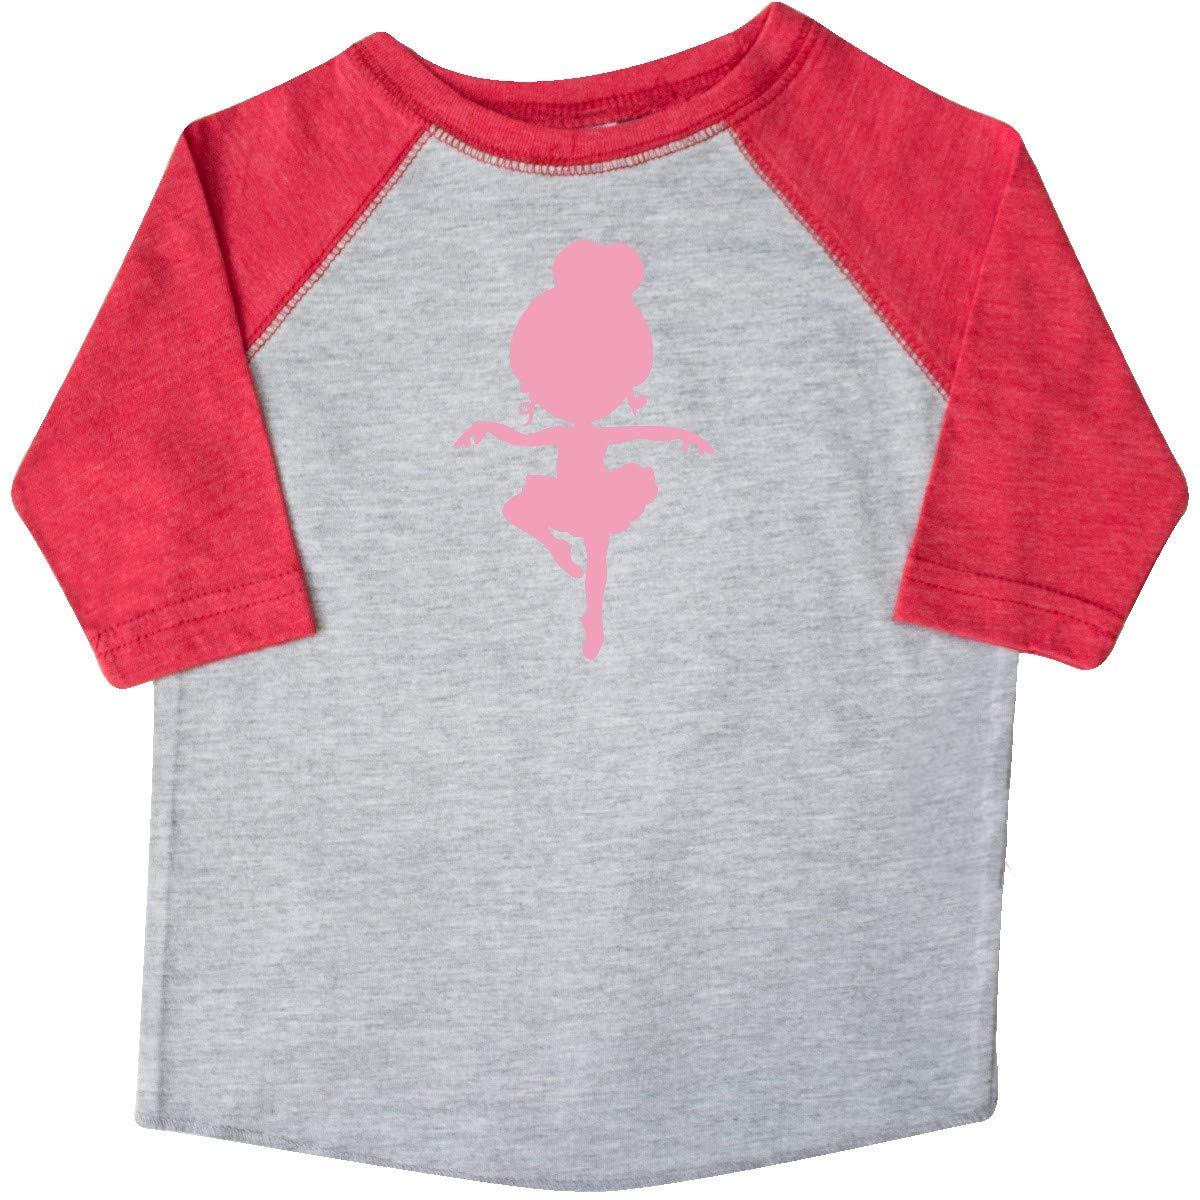 inktastic Dancing Ballerina Toddler T-Shirt